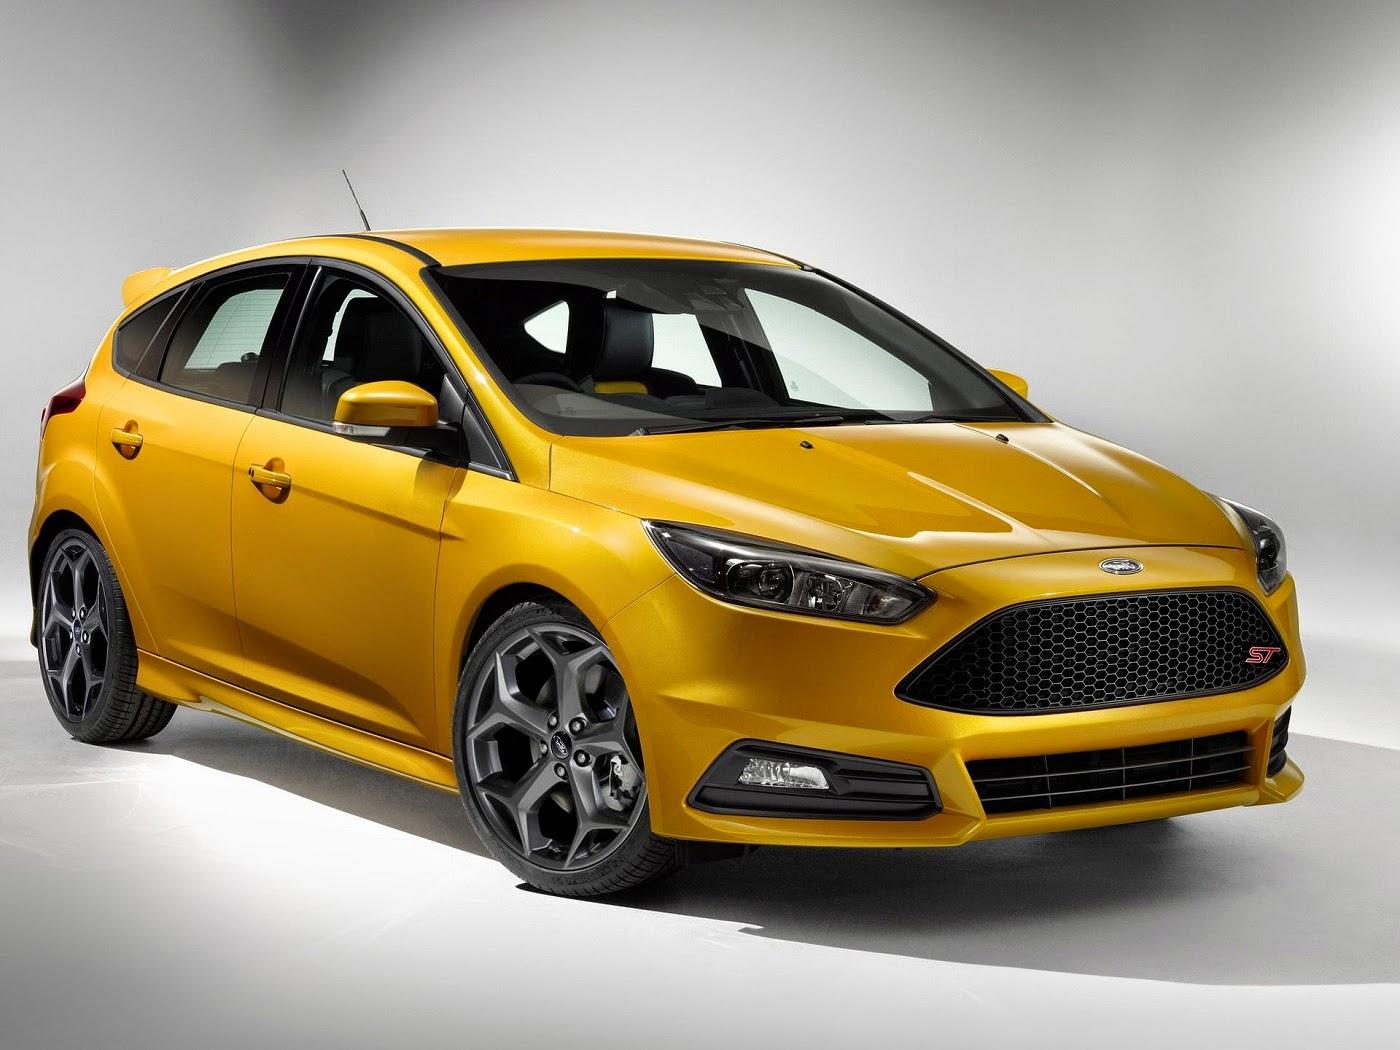 2015 ford focus st 2 0 liter ecoboost 252 hp car reviews new car pictures for 2018 2019. Black Bedroom Furniture Sets. Home Design Ideas